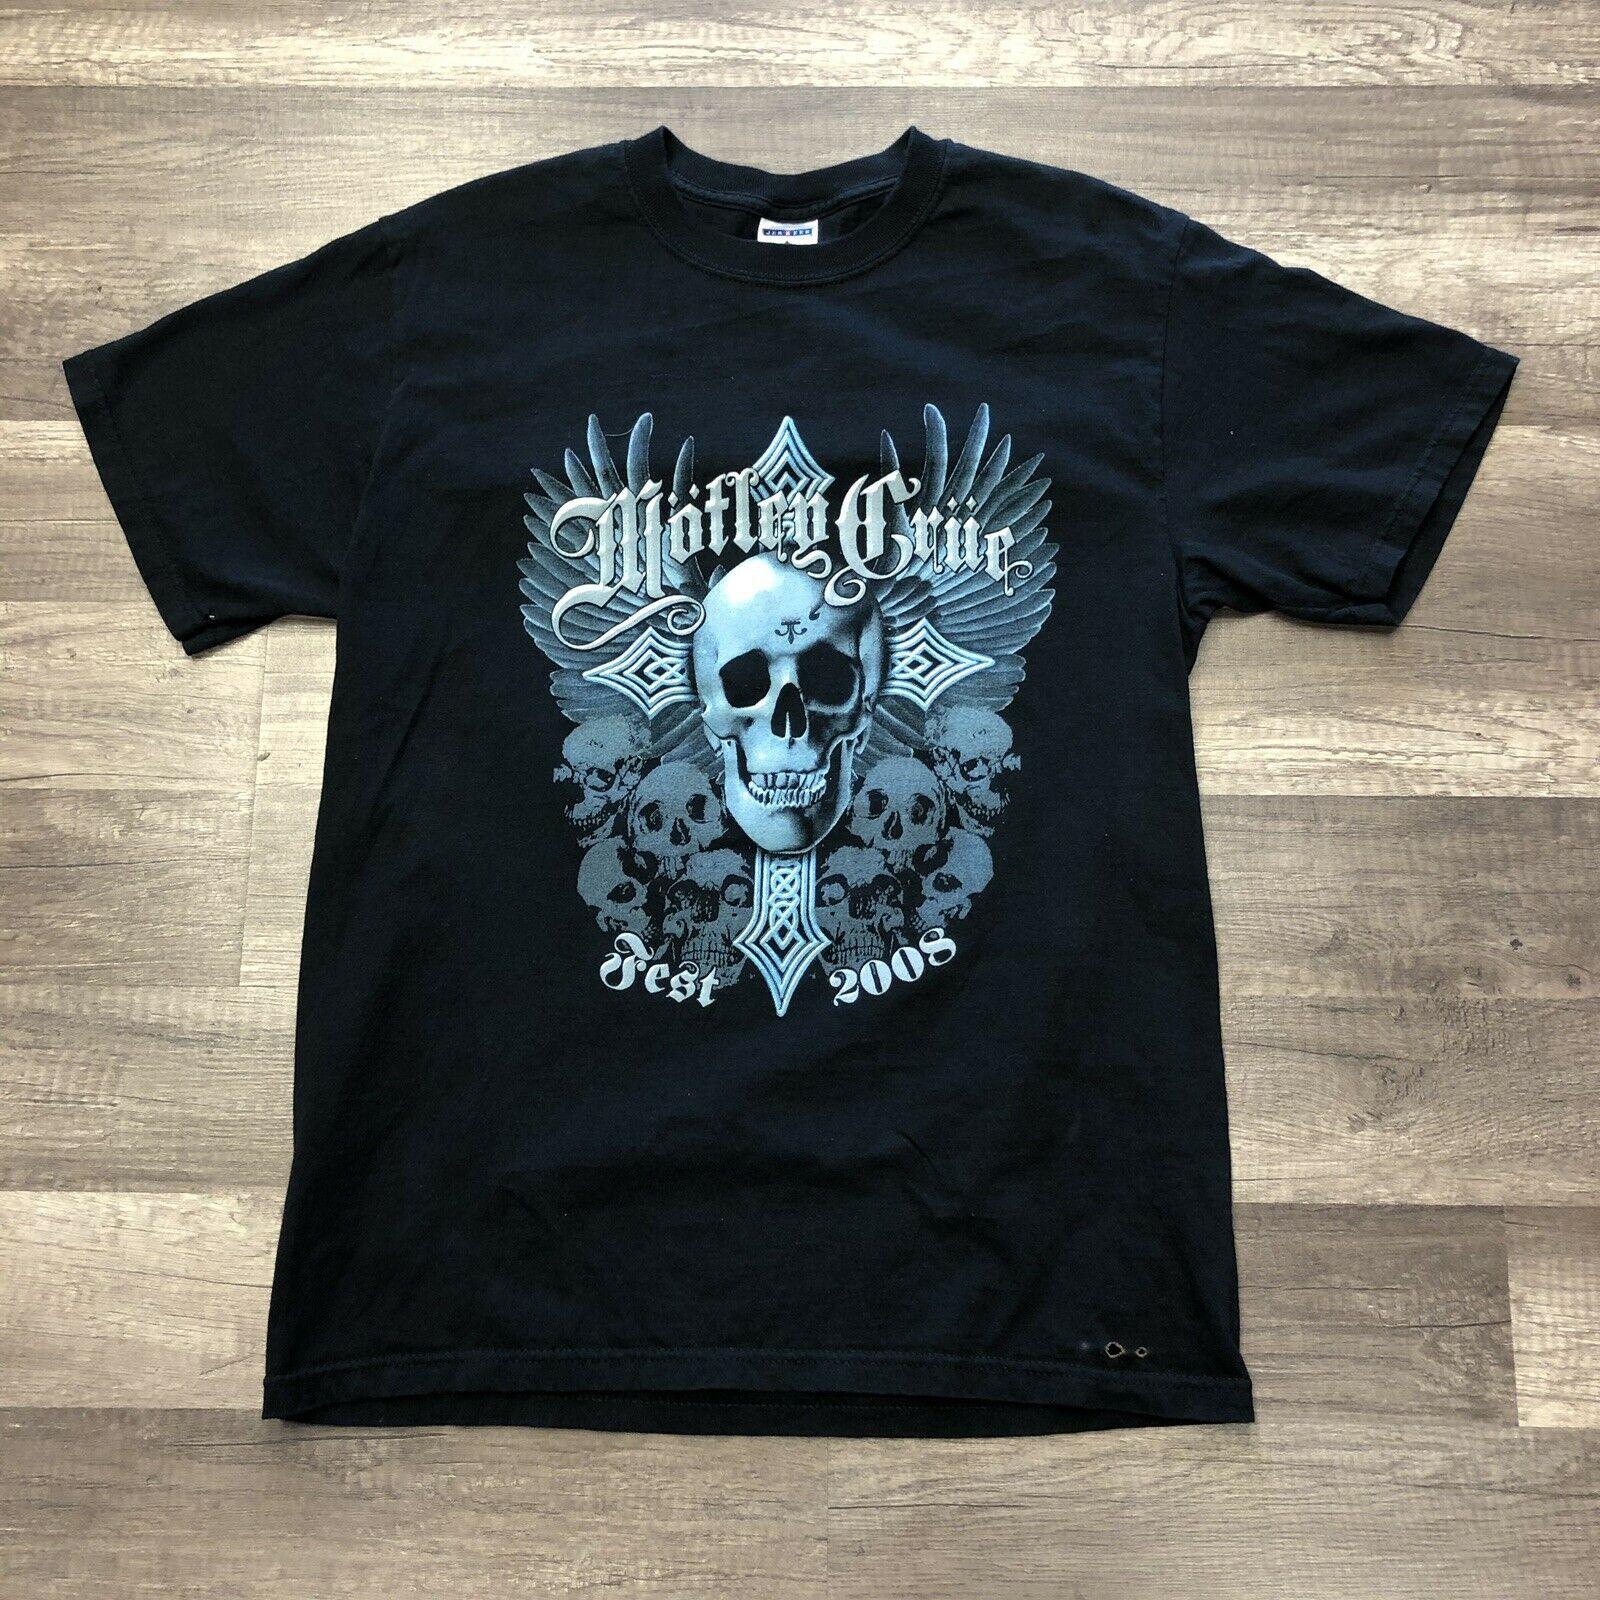 Rare Motley Crue 2008 Fest T-Shirt Papa Roach Trapt Buckcherry Sixx M Vtg Printed T Shirt 2018 Fashion Brand Top Tee